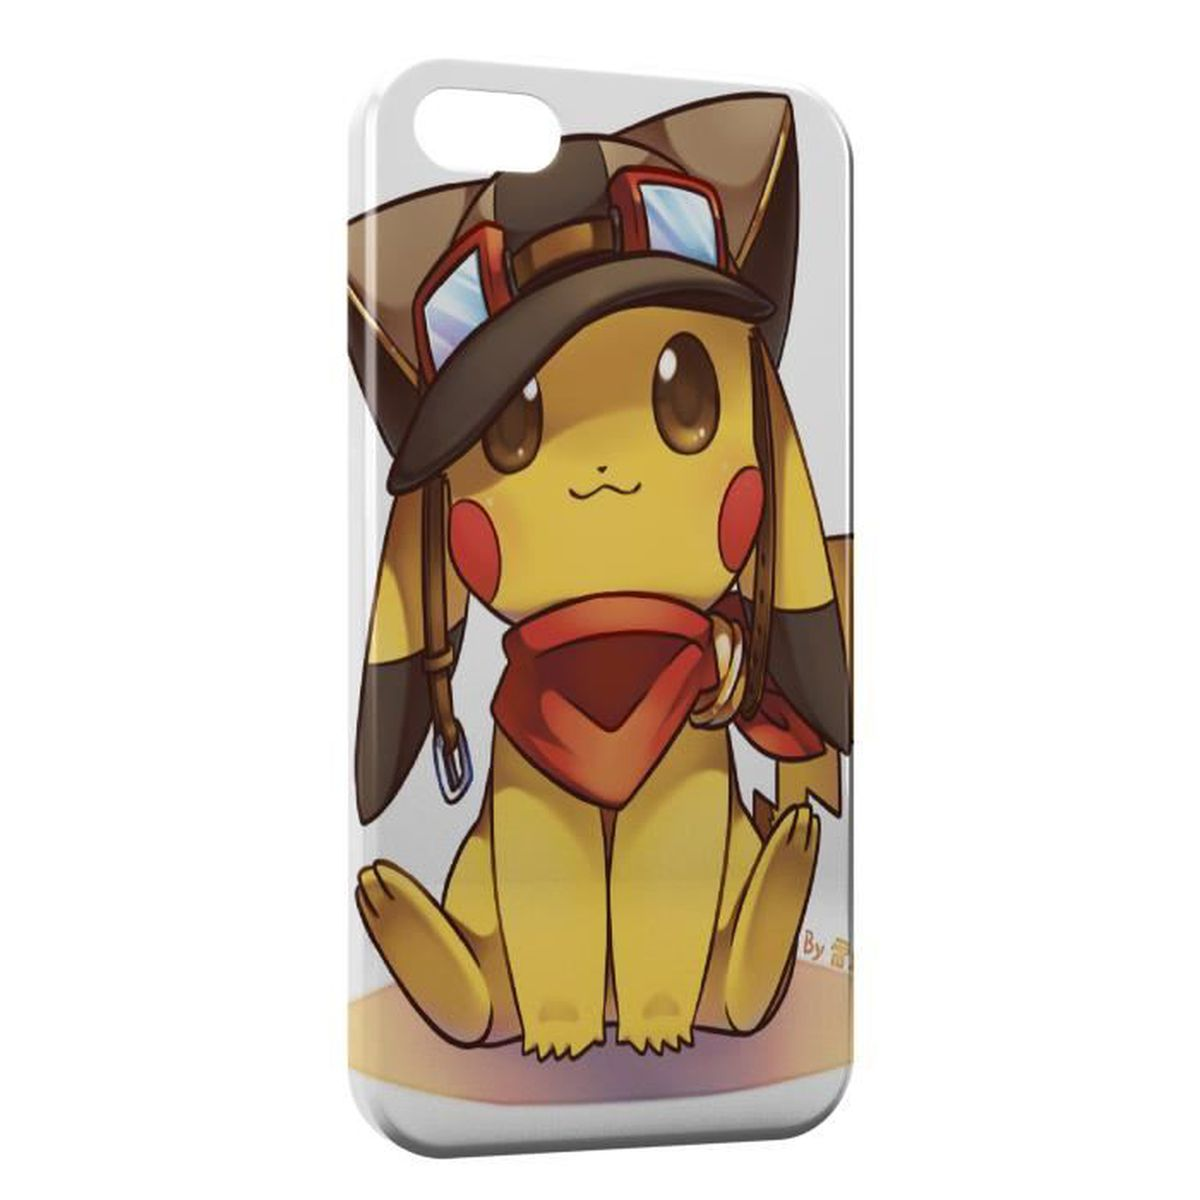 coque iphone se pikachu aviateur pokemon cute